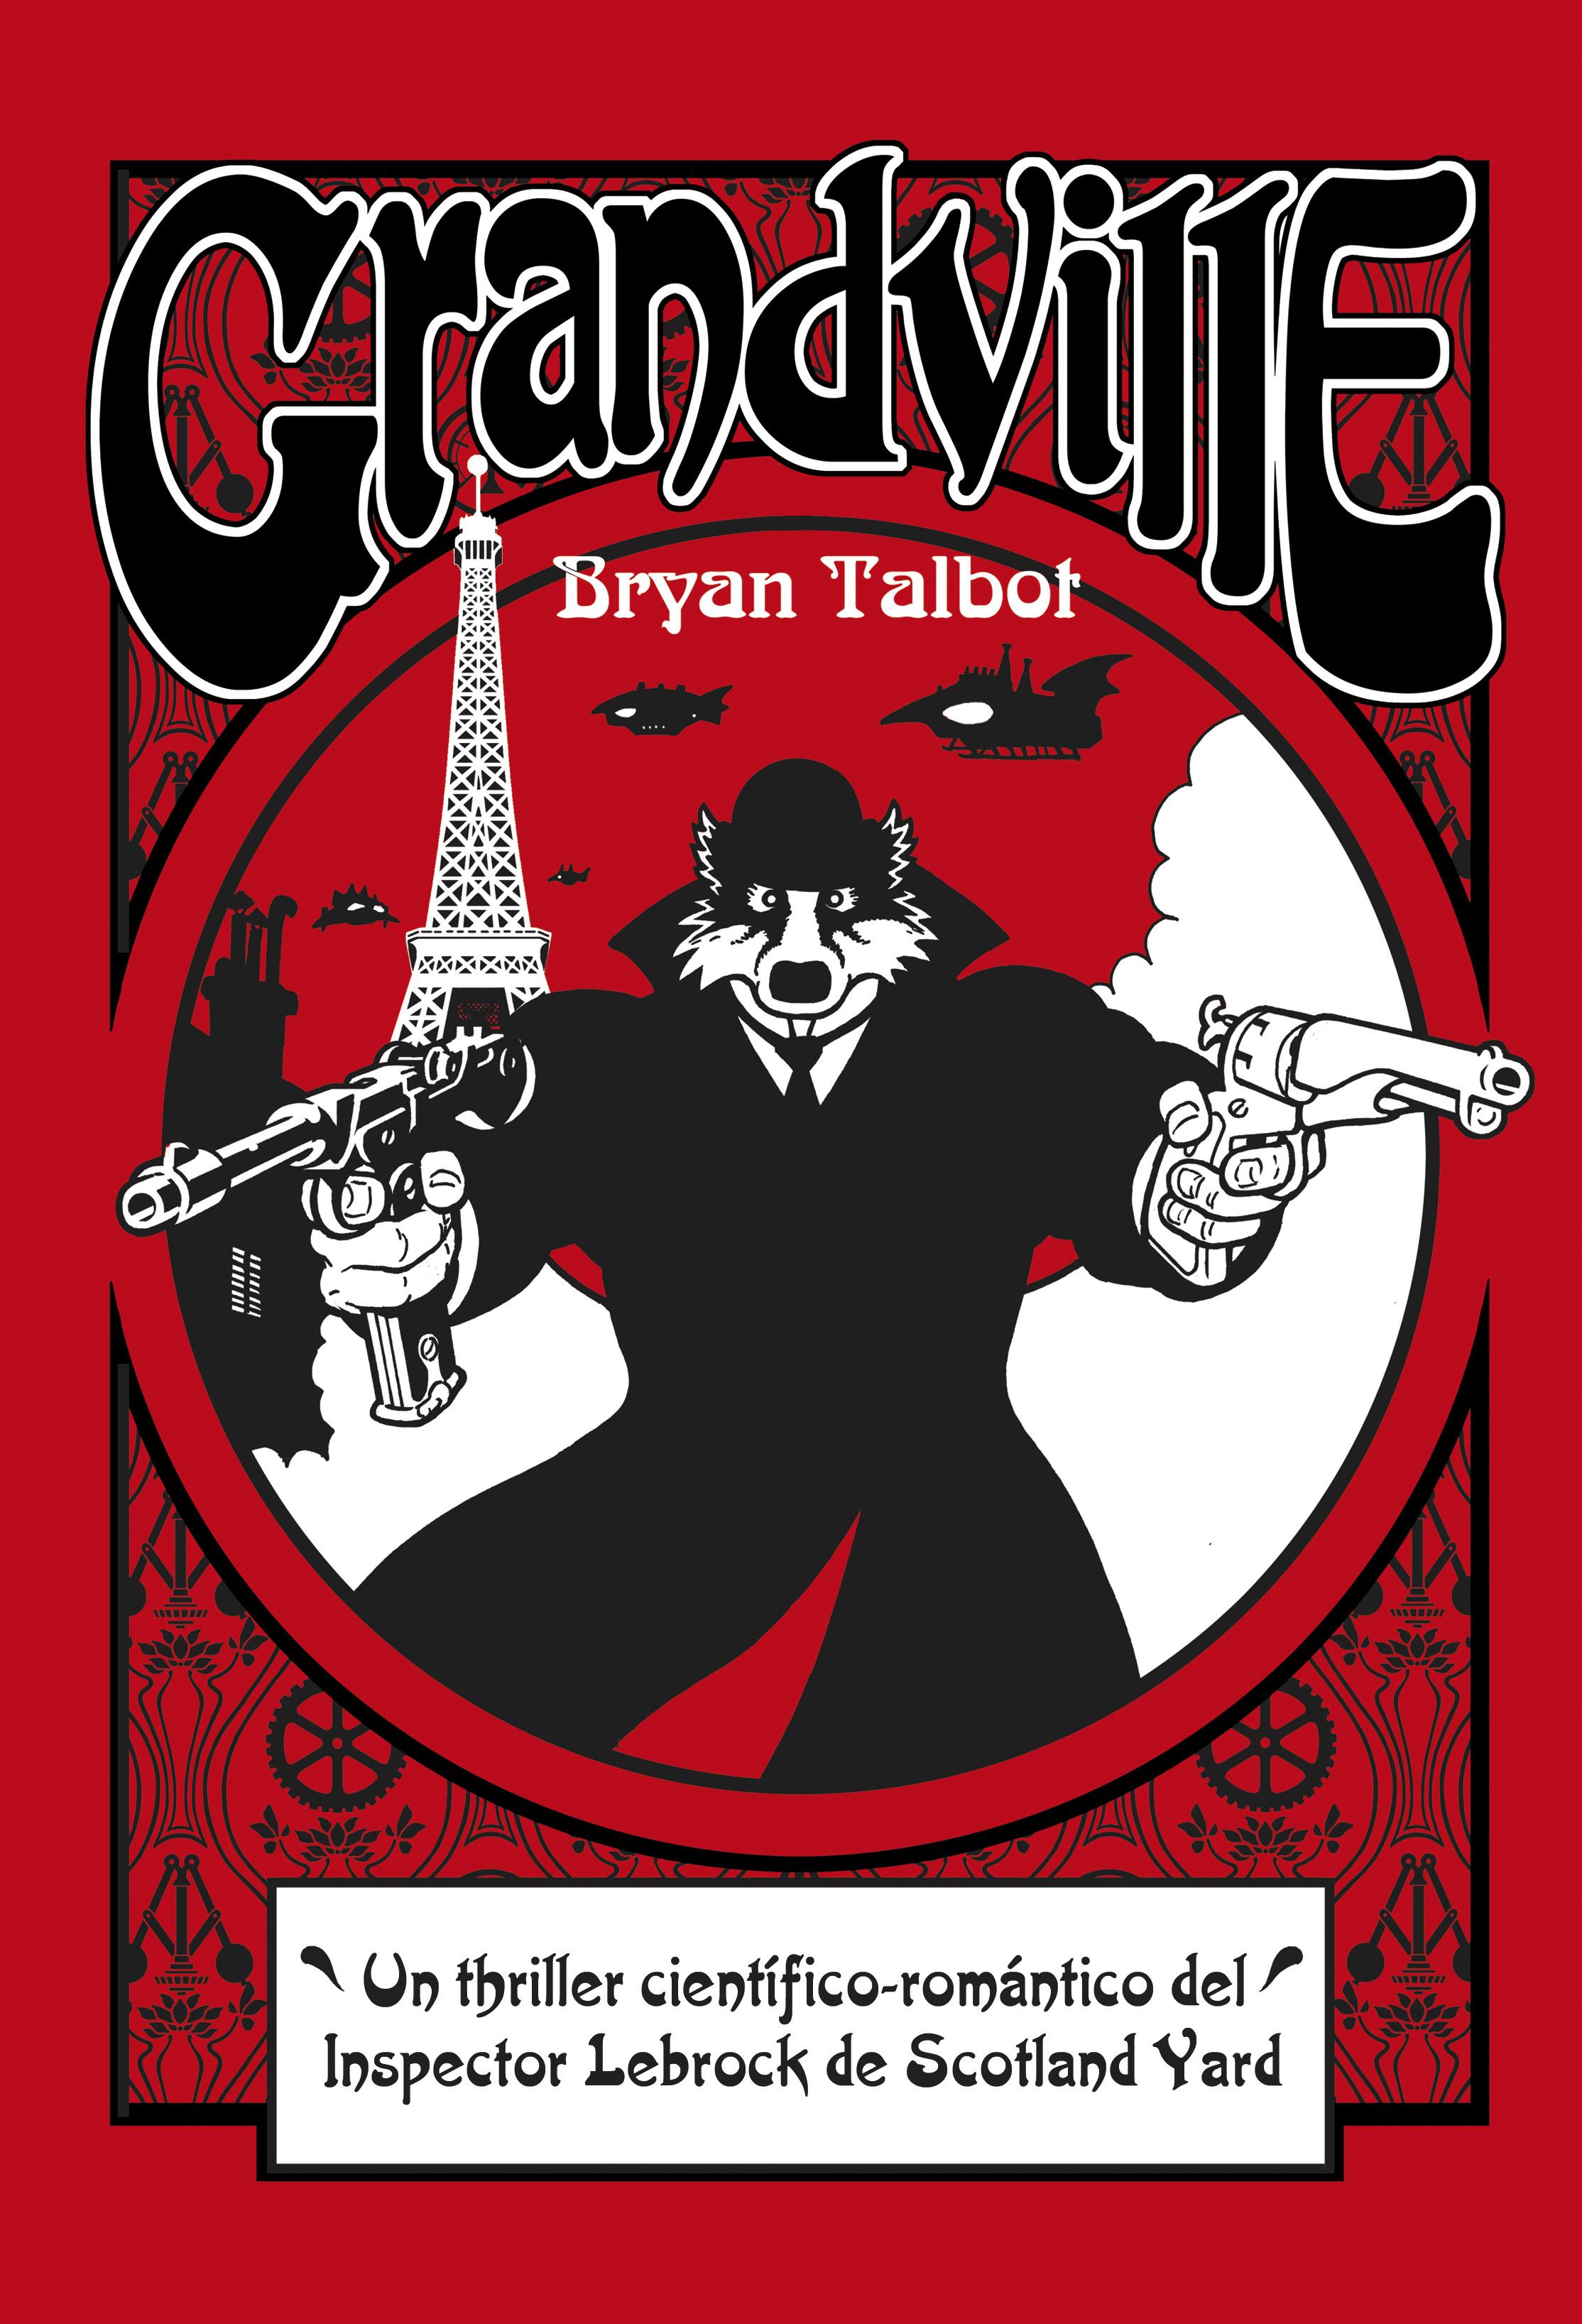 Granville by Bryan Talbot